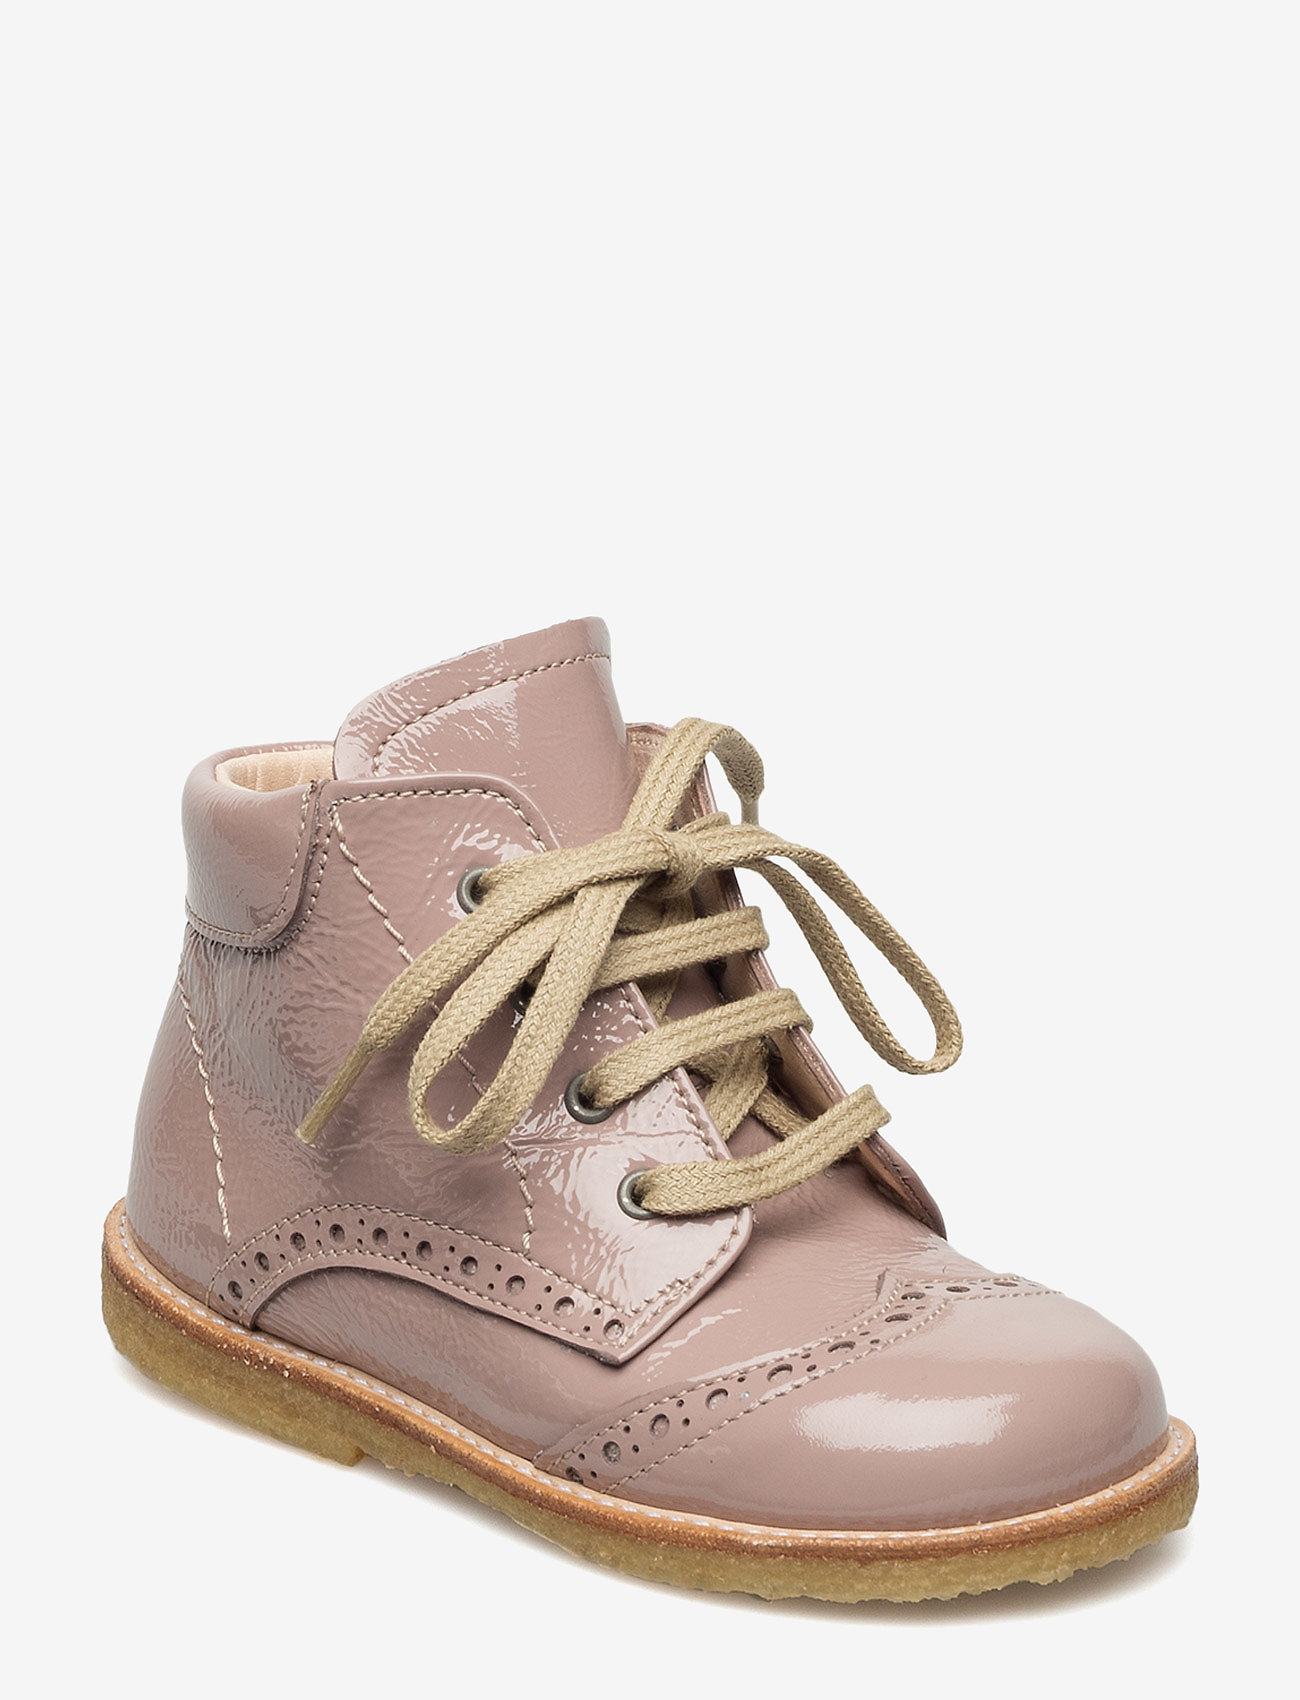 ANGULUS - Baby shoe - sko - 1387 rose - 0